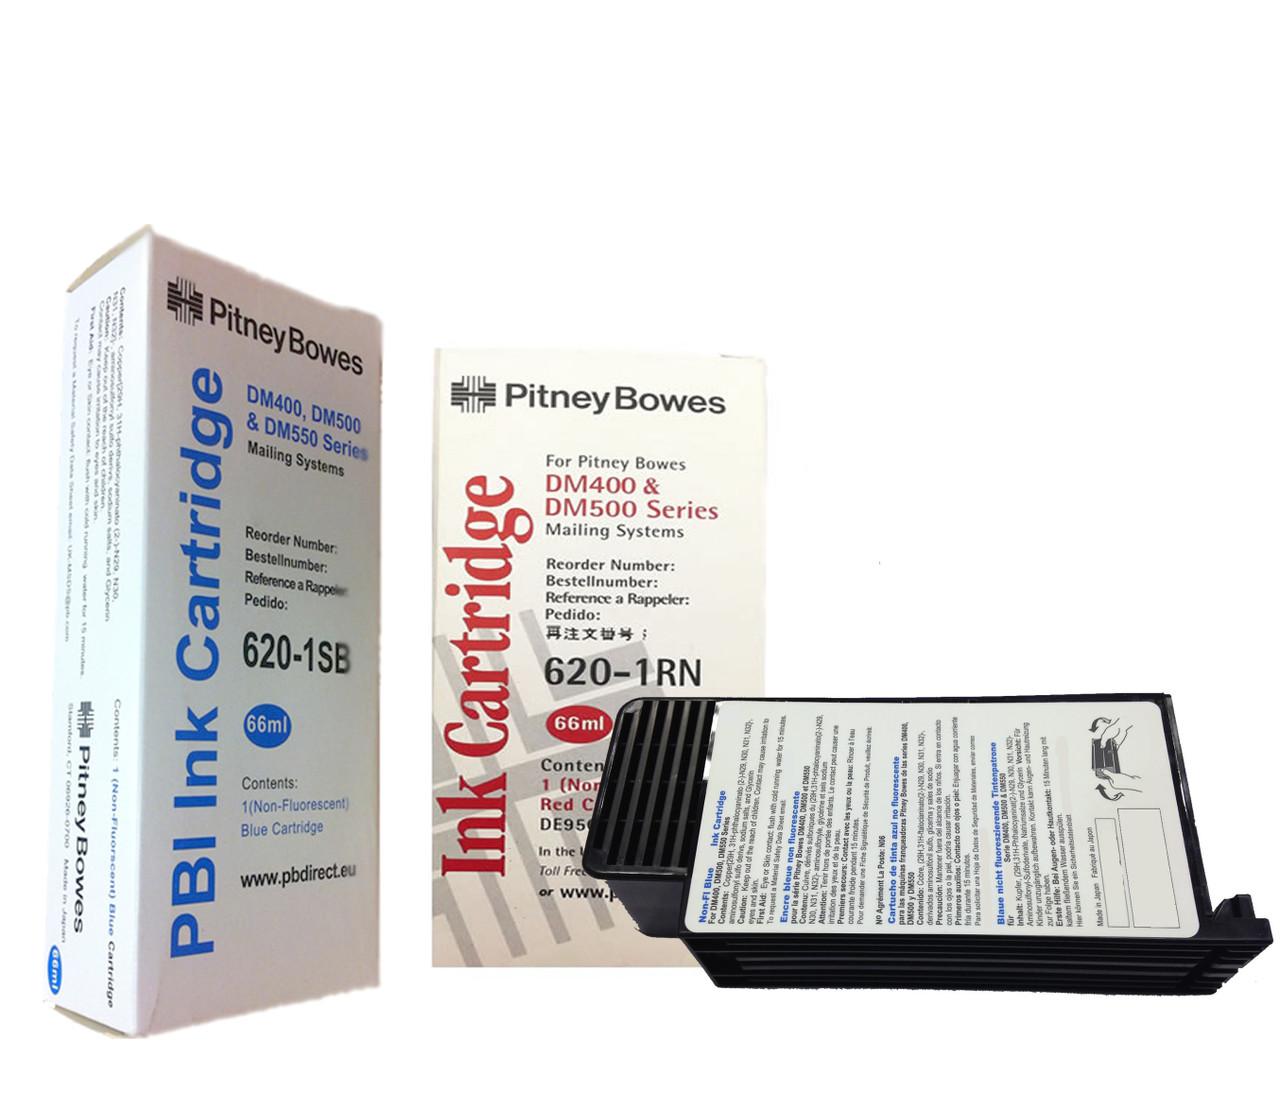 Original Pitney Bowes DM400, DM500 & DM550 Franking Ink Cartridge